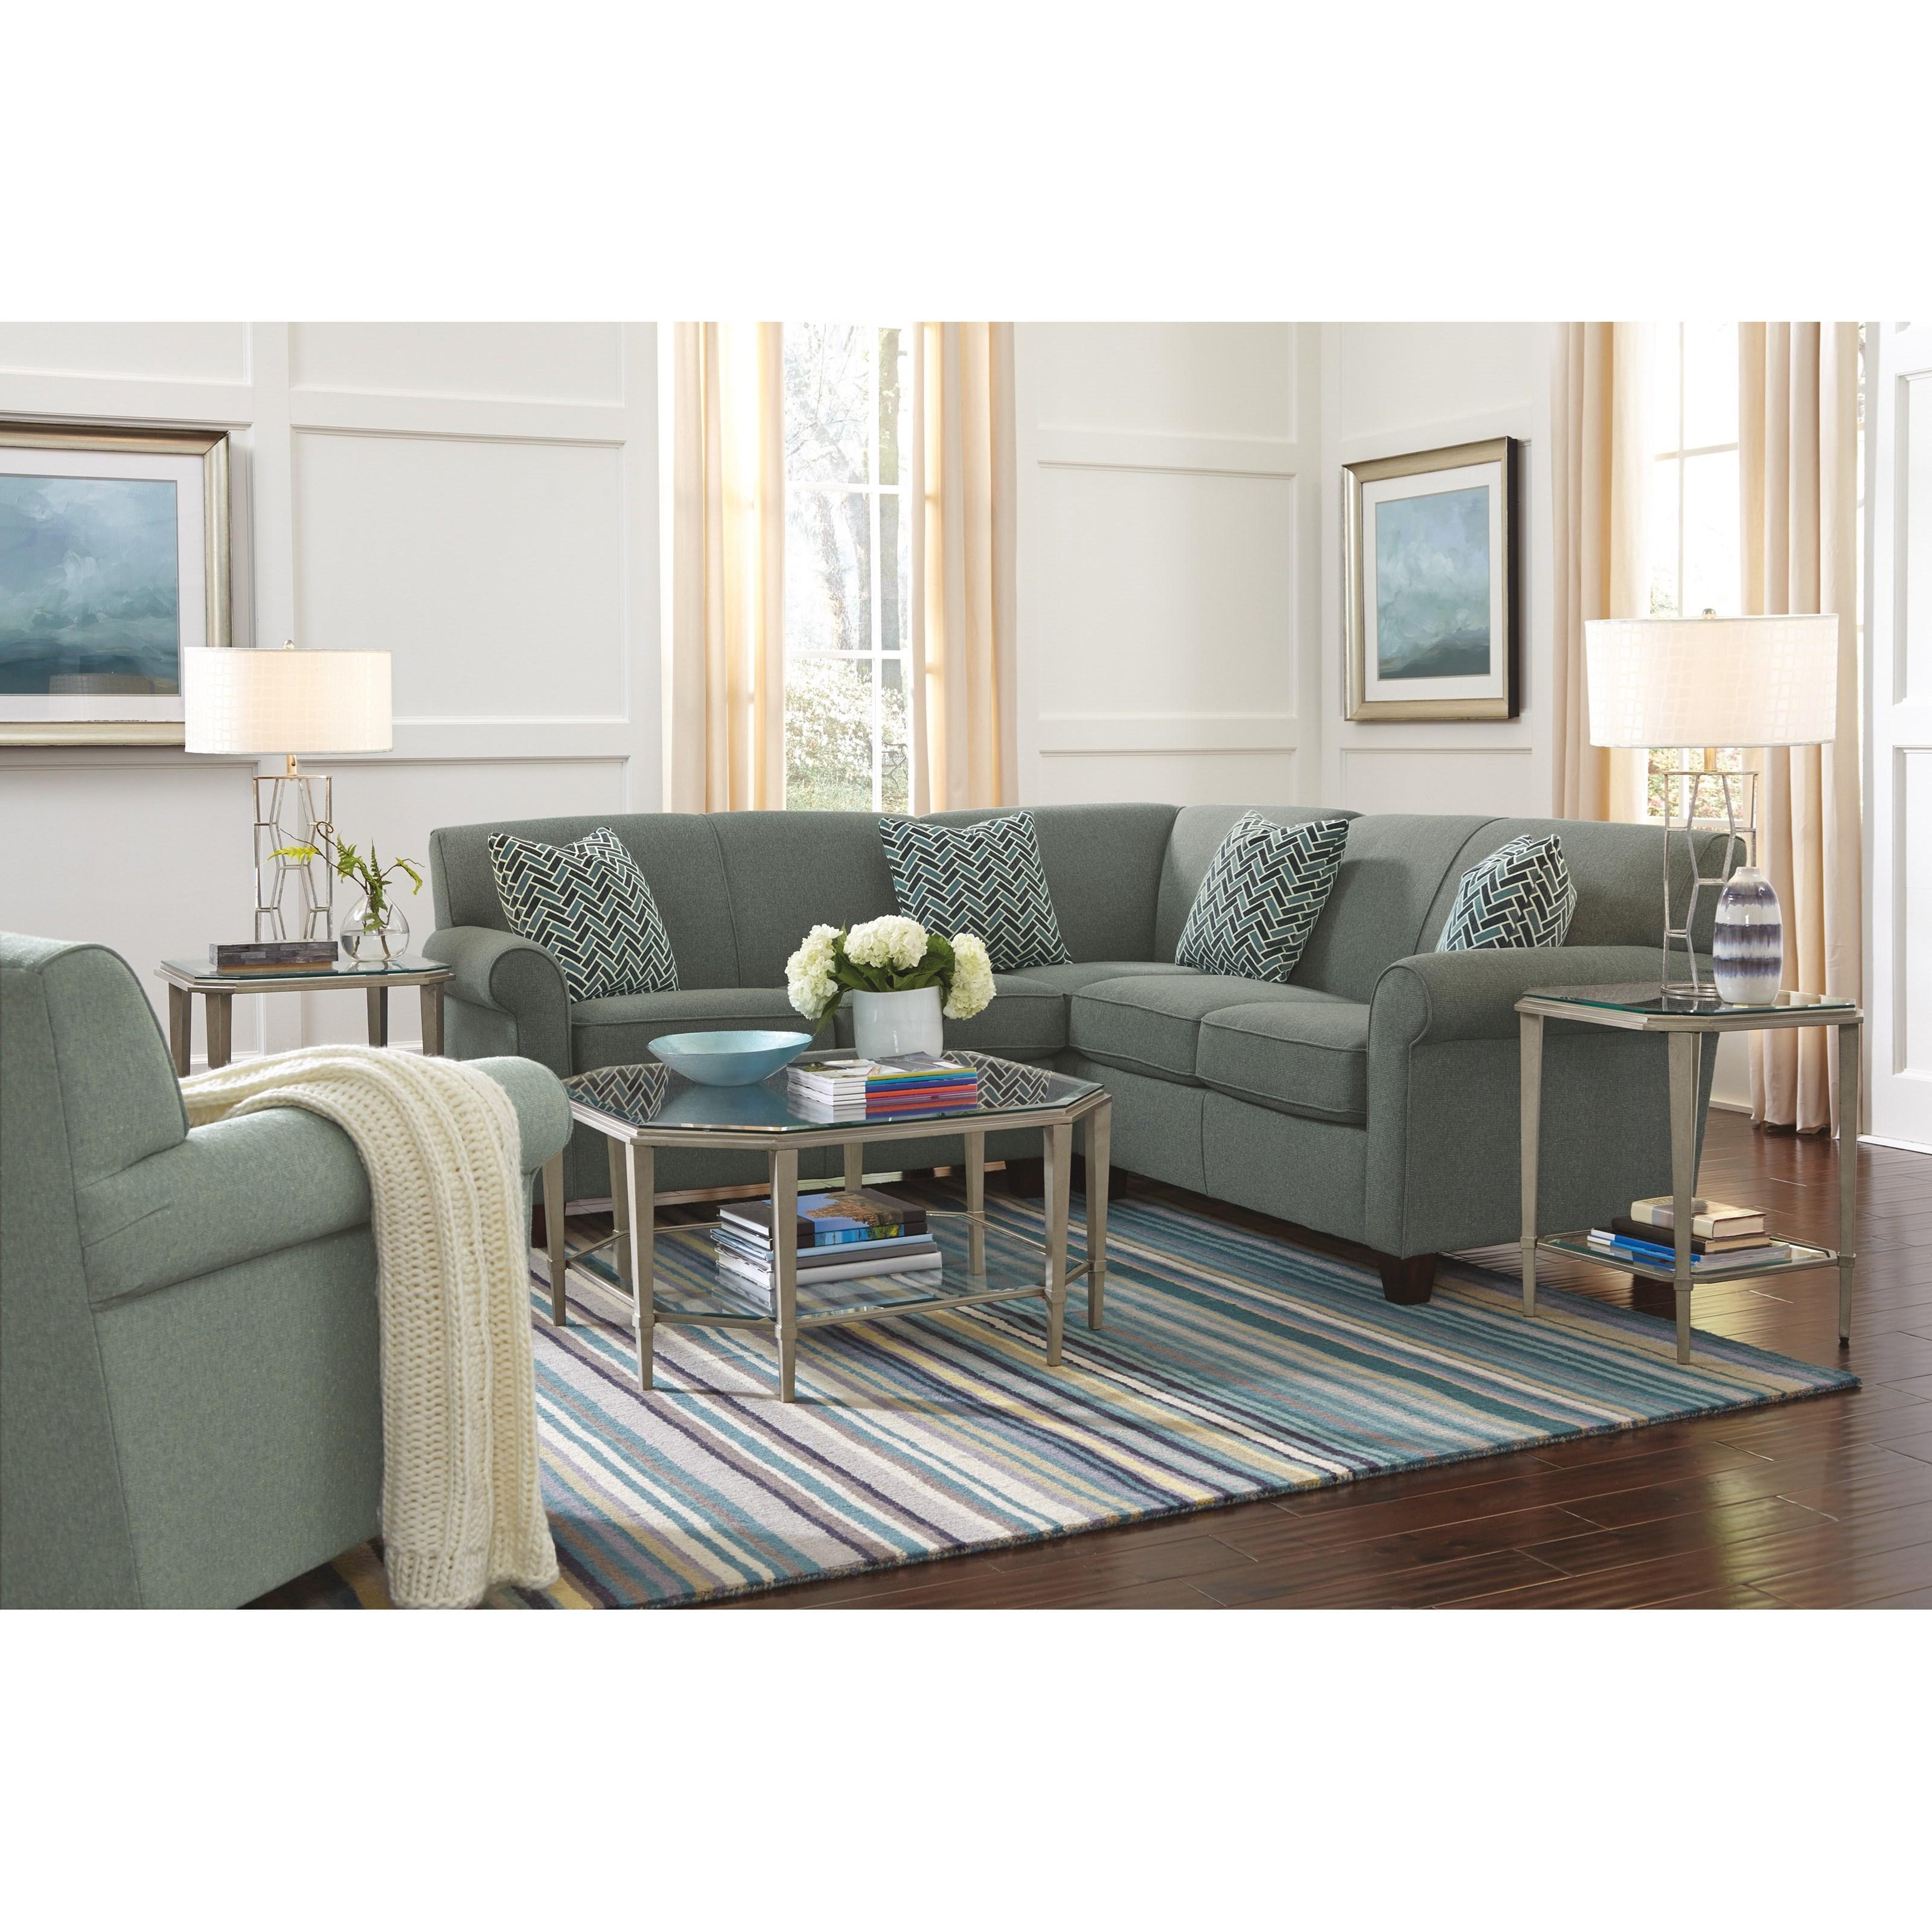 Dana 2 Pc Corner Sectional Sofa by Flexsteel at Mueller Furniture